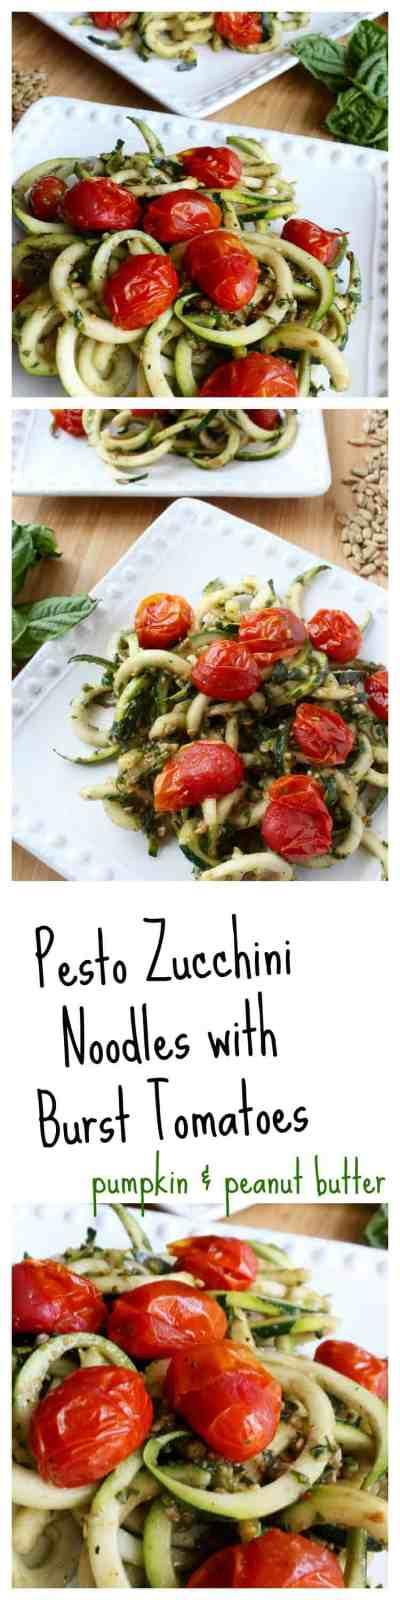 Pesto Zucchini Noodles with Burst Tomatoes // pumpkin & peanut butter